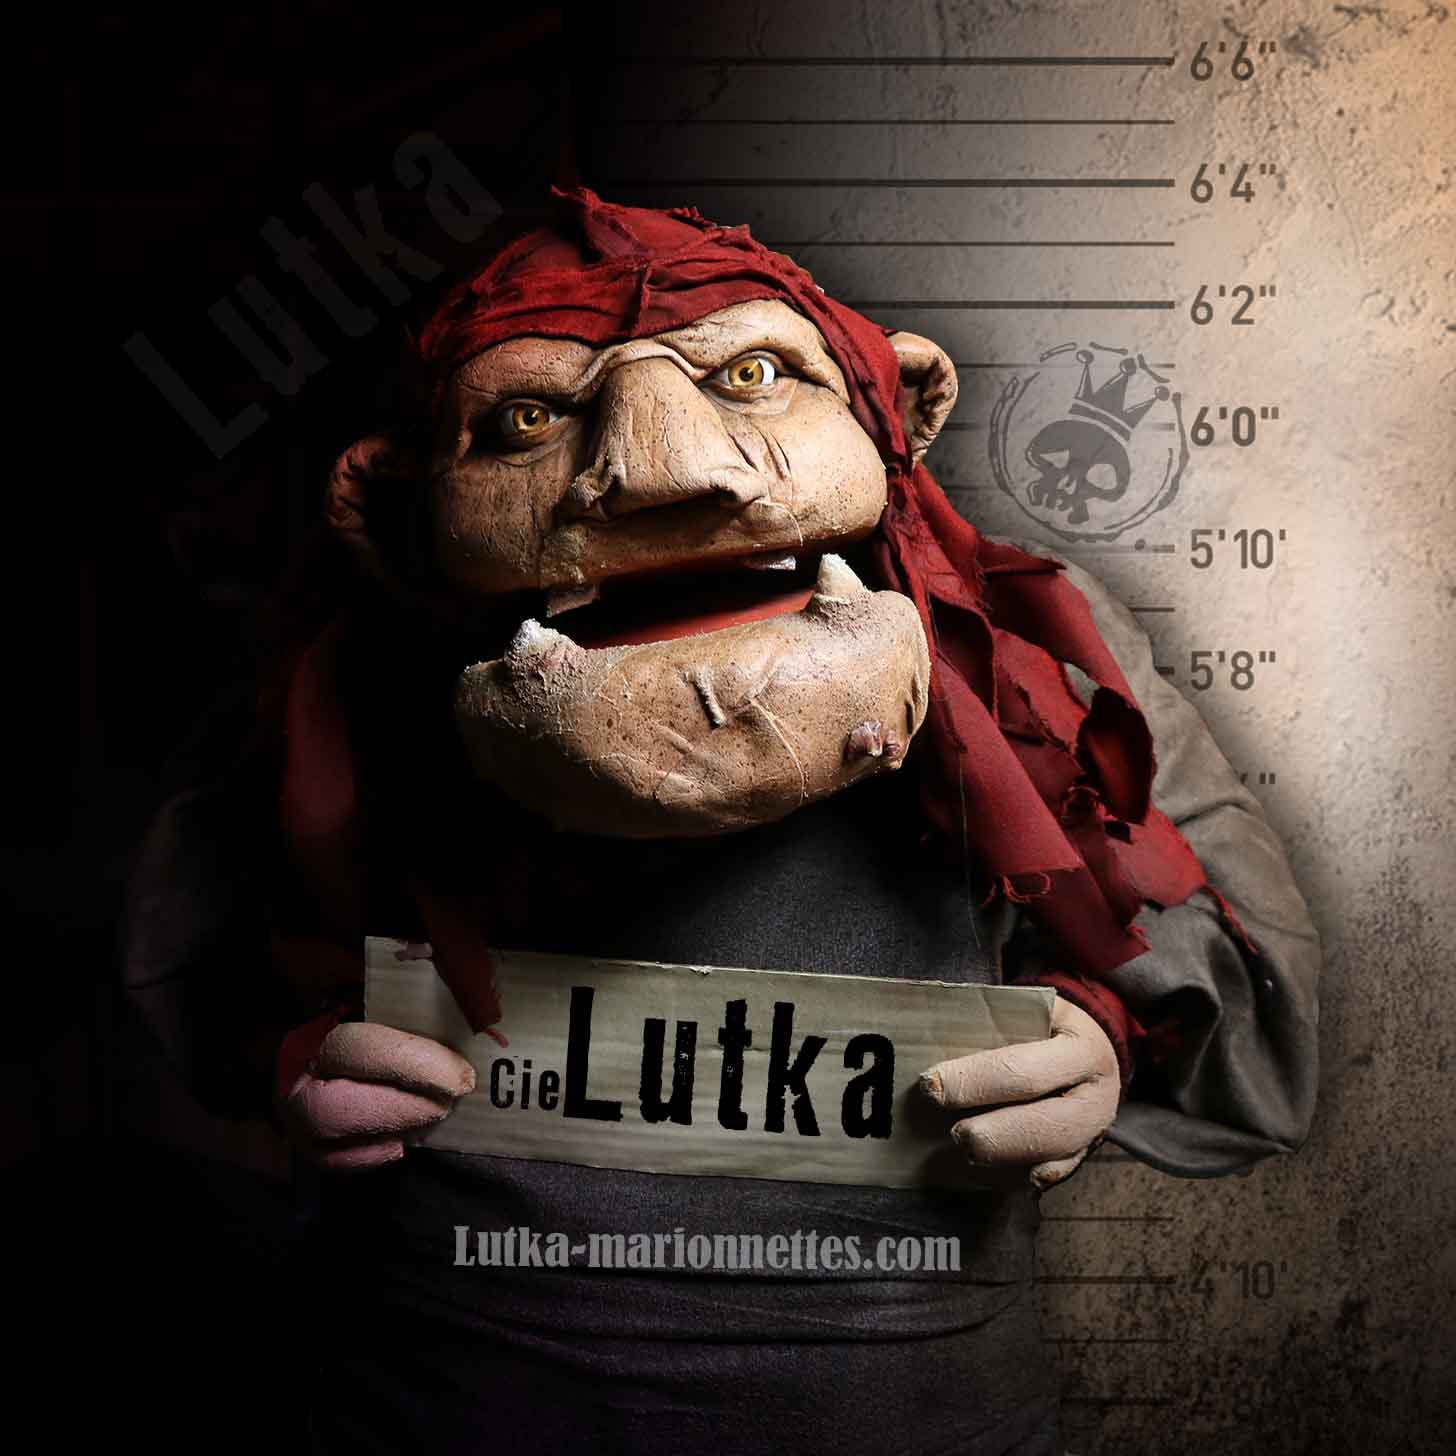 Cie Lutka Marionnettes